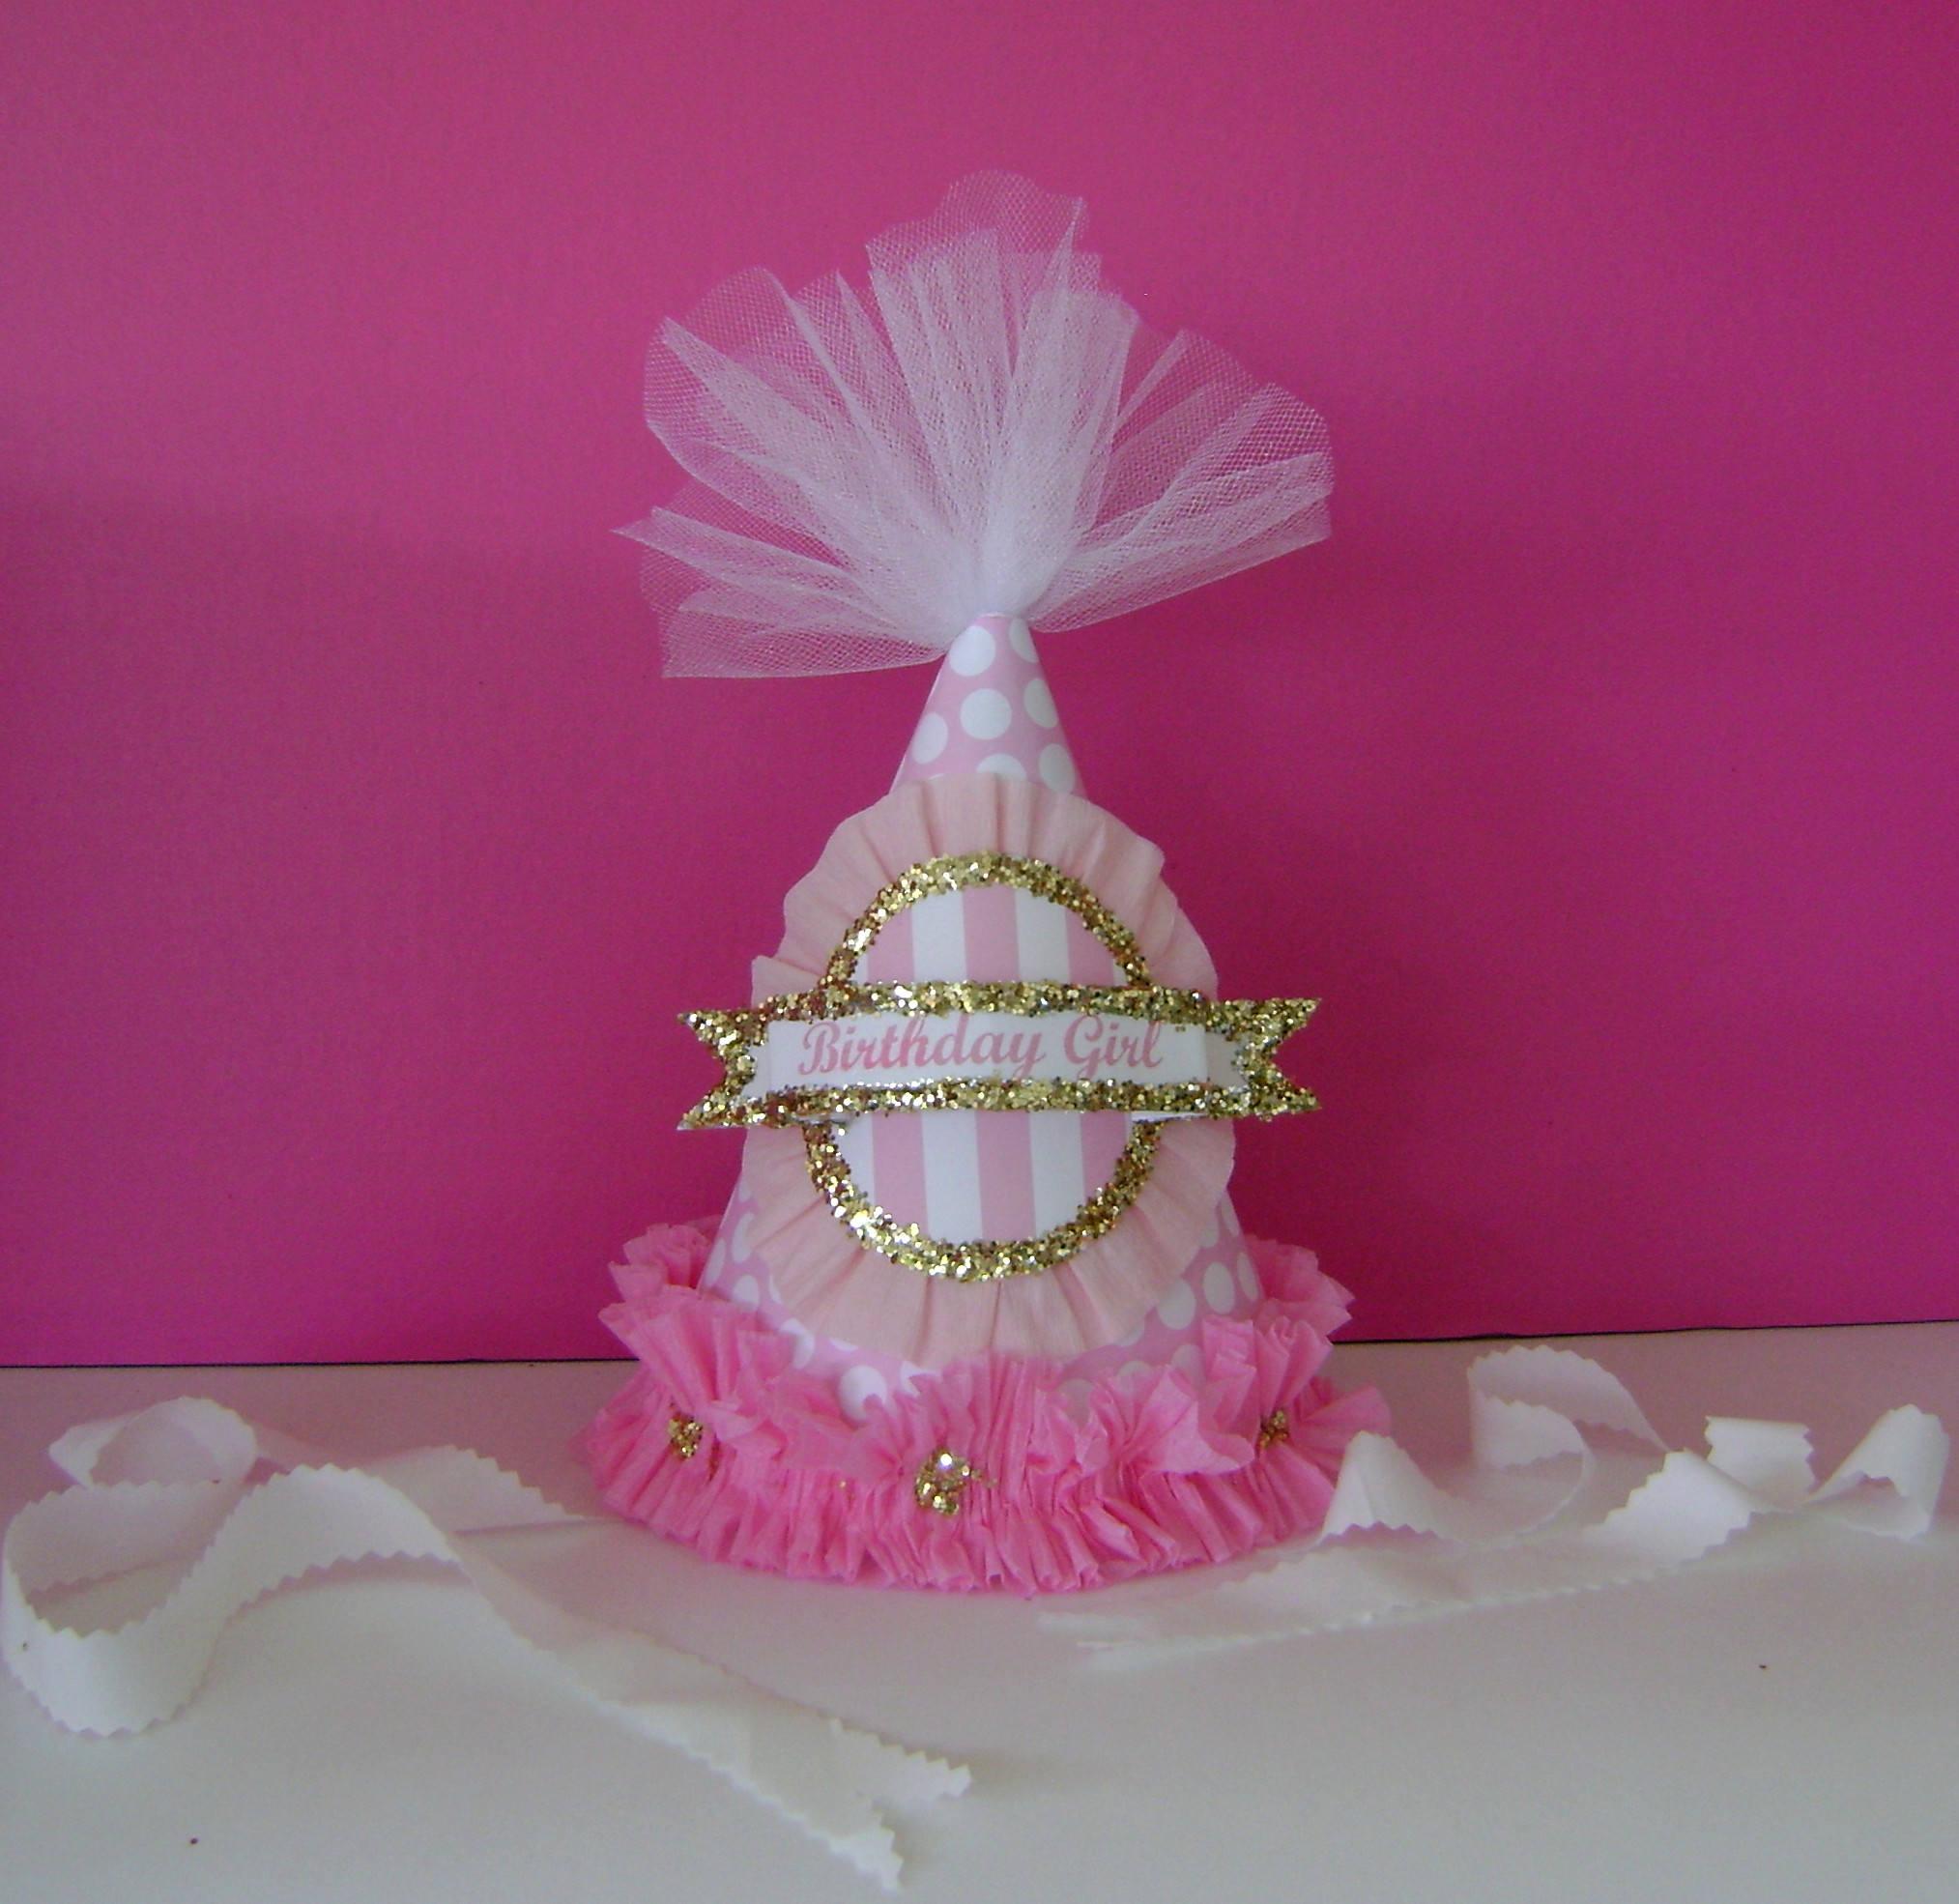 Birthday Hat Small cone birthday hat Birthday Girl Hat